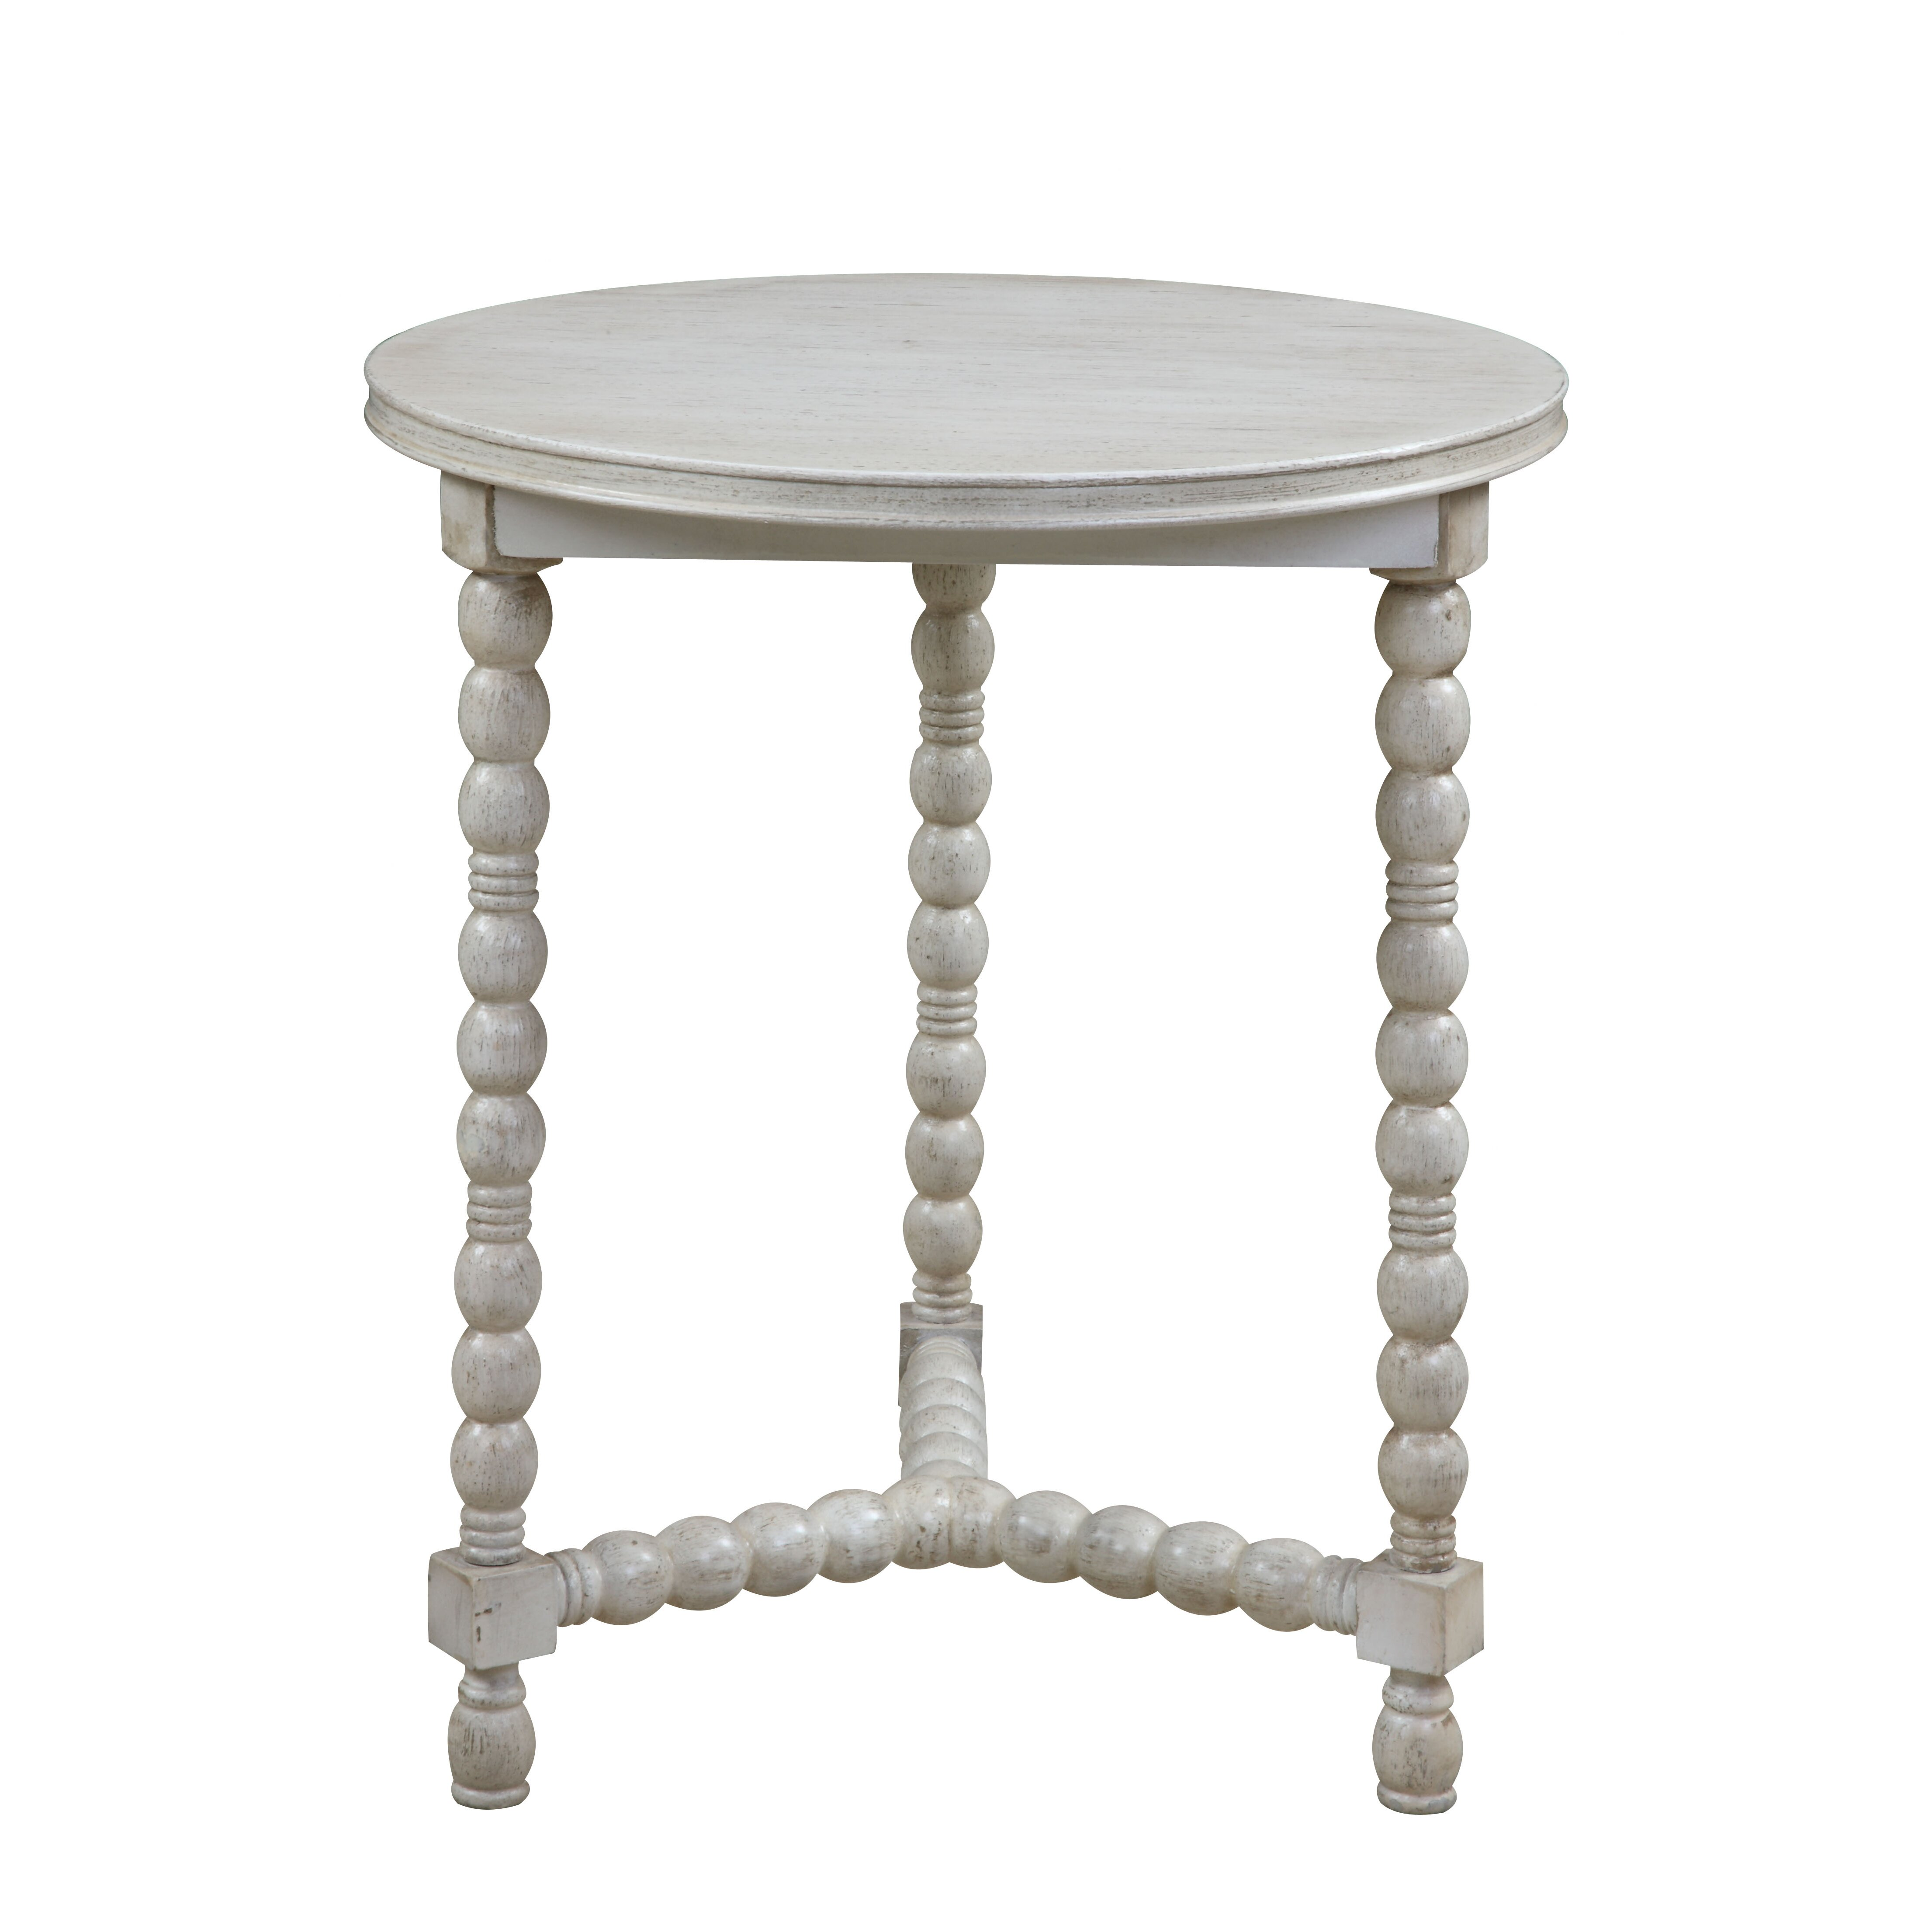 beachcrest home dublin end table reviews wayfair. Black Bedroom Furniture Sets. Home Design Ideas